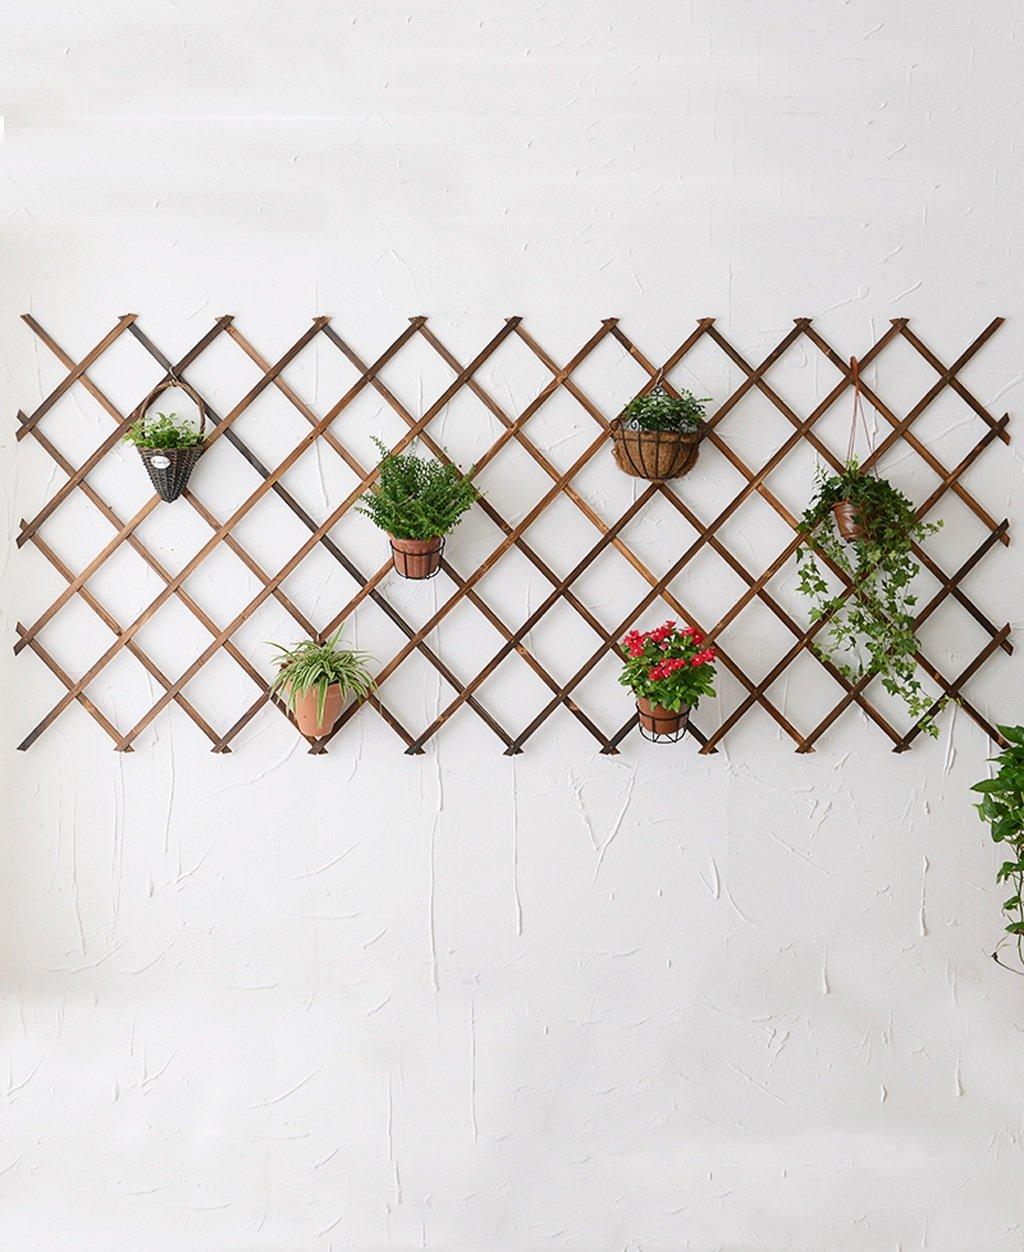 LLD HUAJIA LIANLIAN Wooden Decoration Wall Hanging Flower Frame Garden Wood Grid Frame Outdoor Wooden Fence Flower Frame Wall Flower Frame Flower Rack Garden Shelf (Size : 29*60cm) Liang liang deng